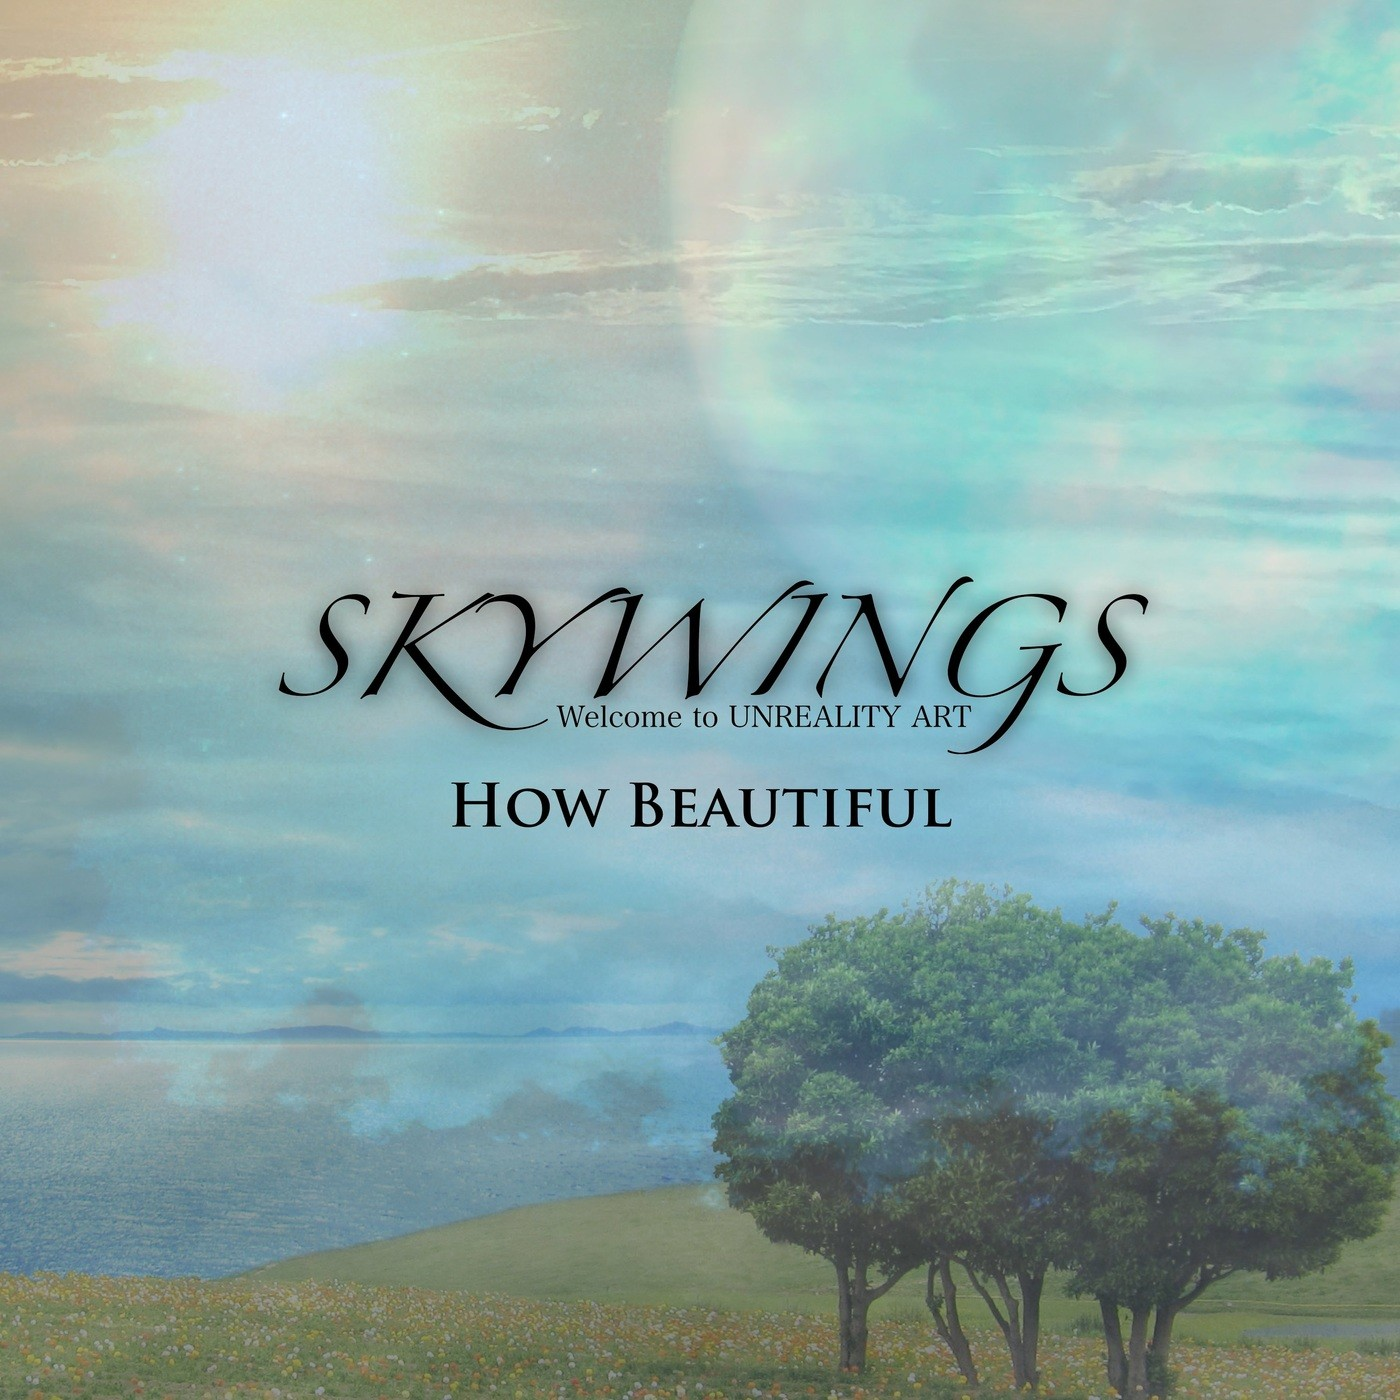 [Album] Skywings – How Beautiful [FLAC / WEB] [2021.02.24]